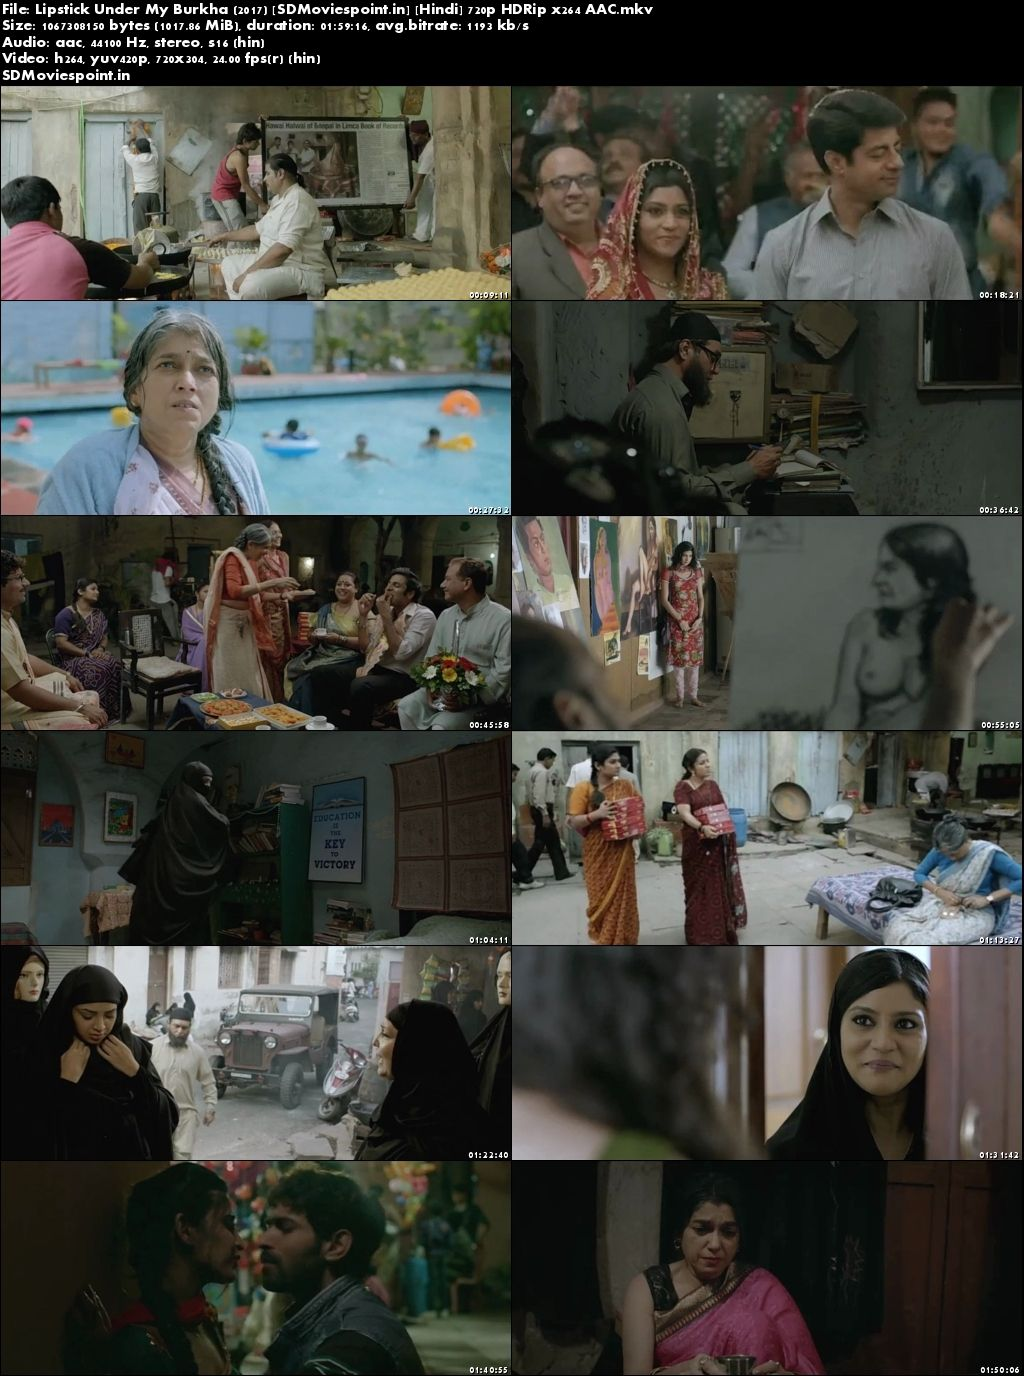 Screen Shots Lipstick Under My Burkha (2016) Full HD Movie Download 720p